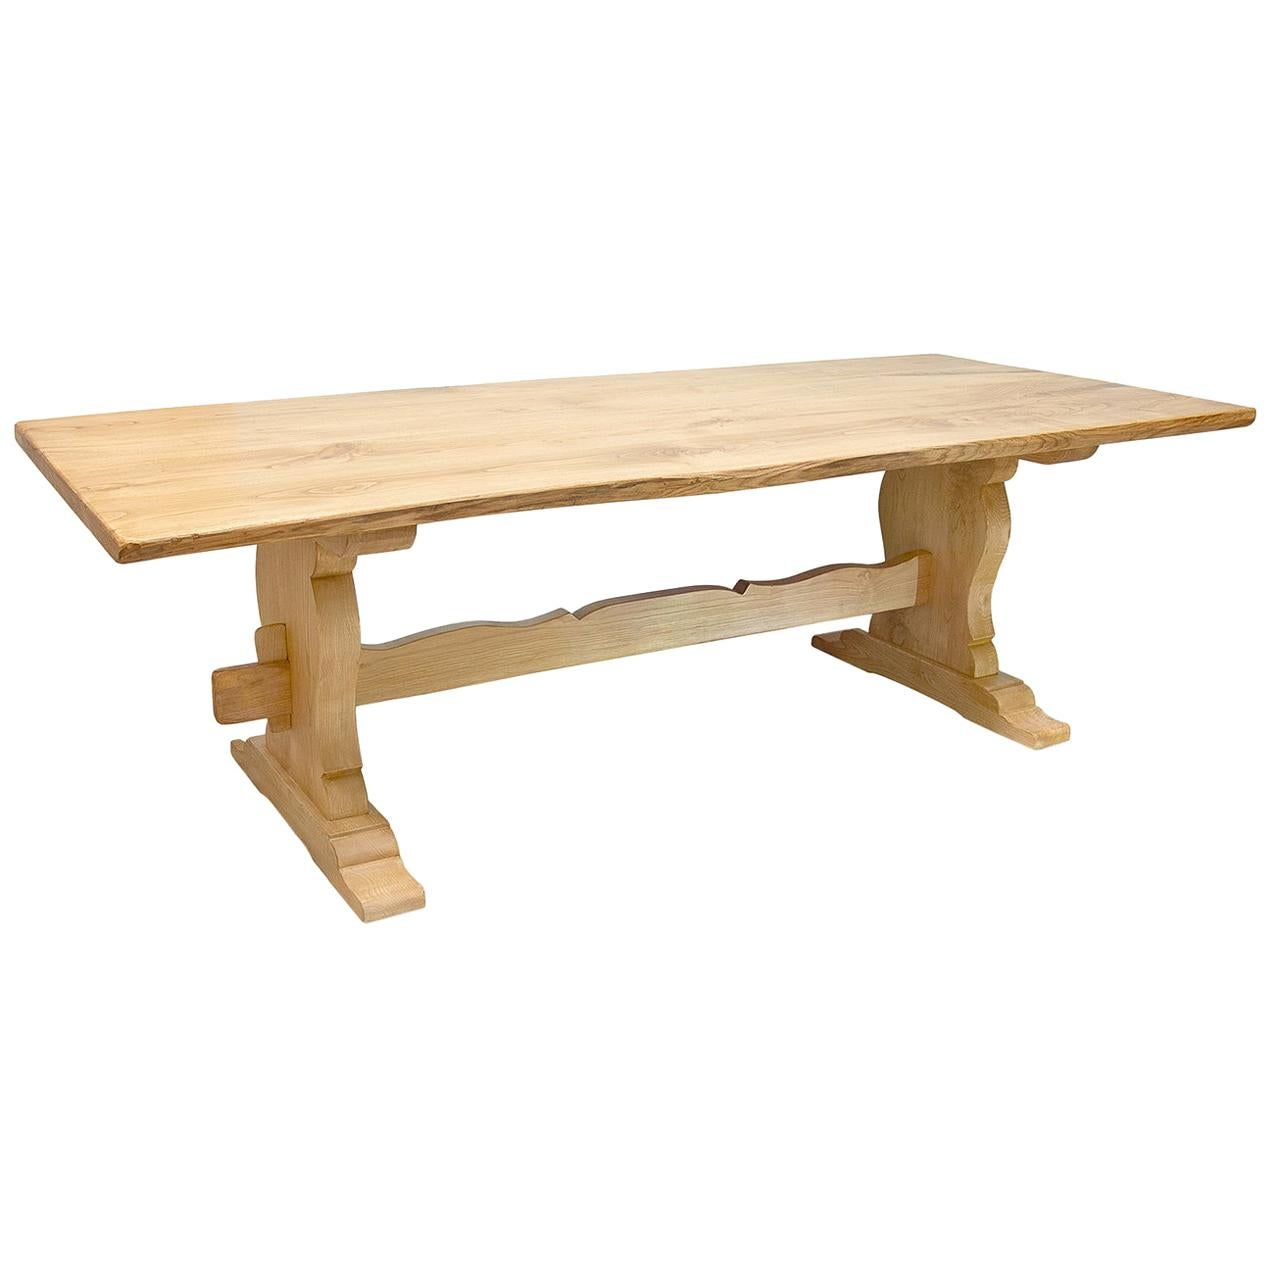 Rustic Rectangular Chestnut Dining Table